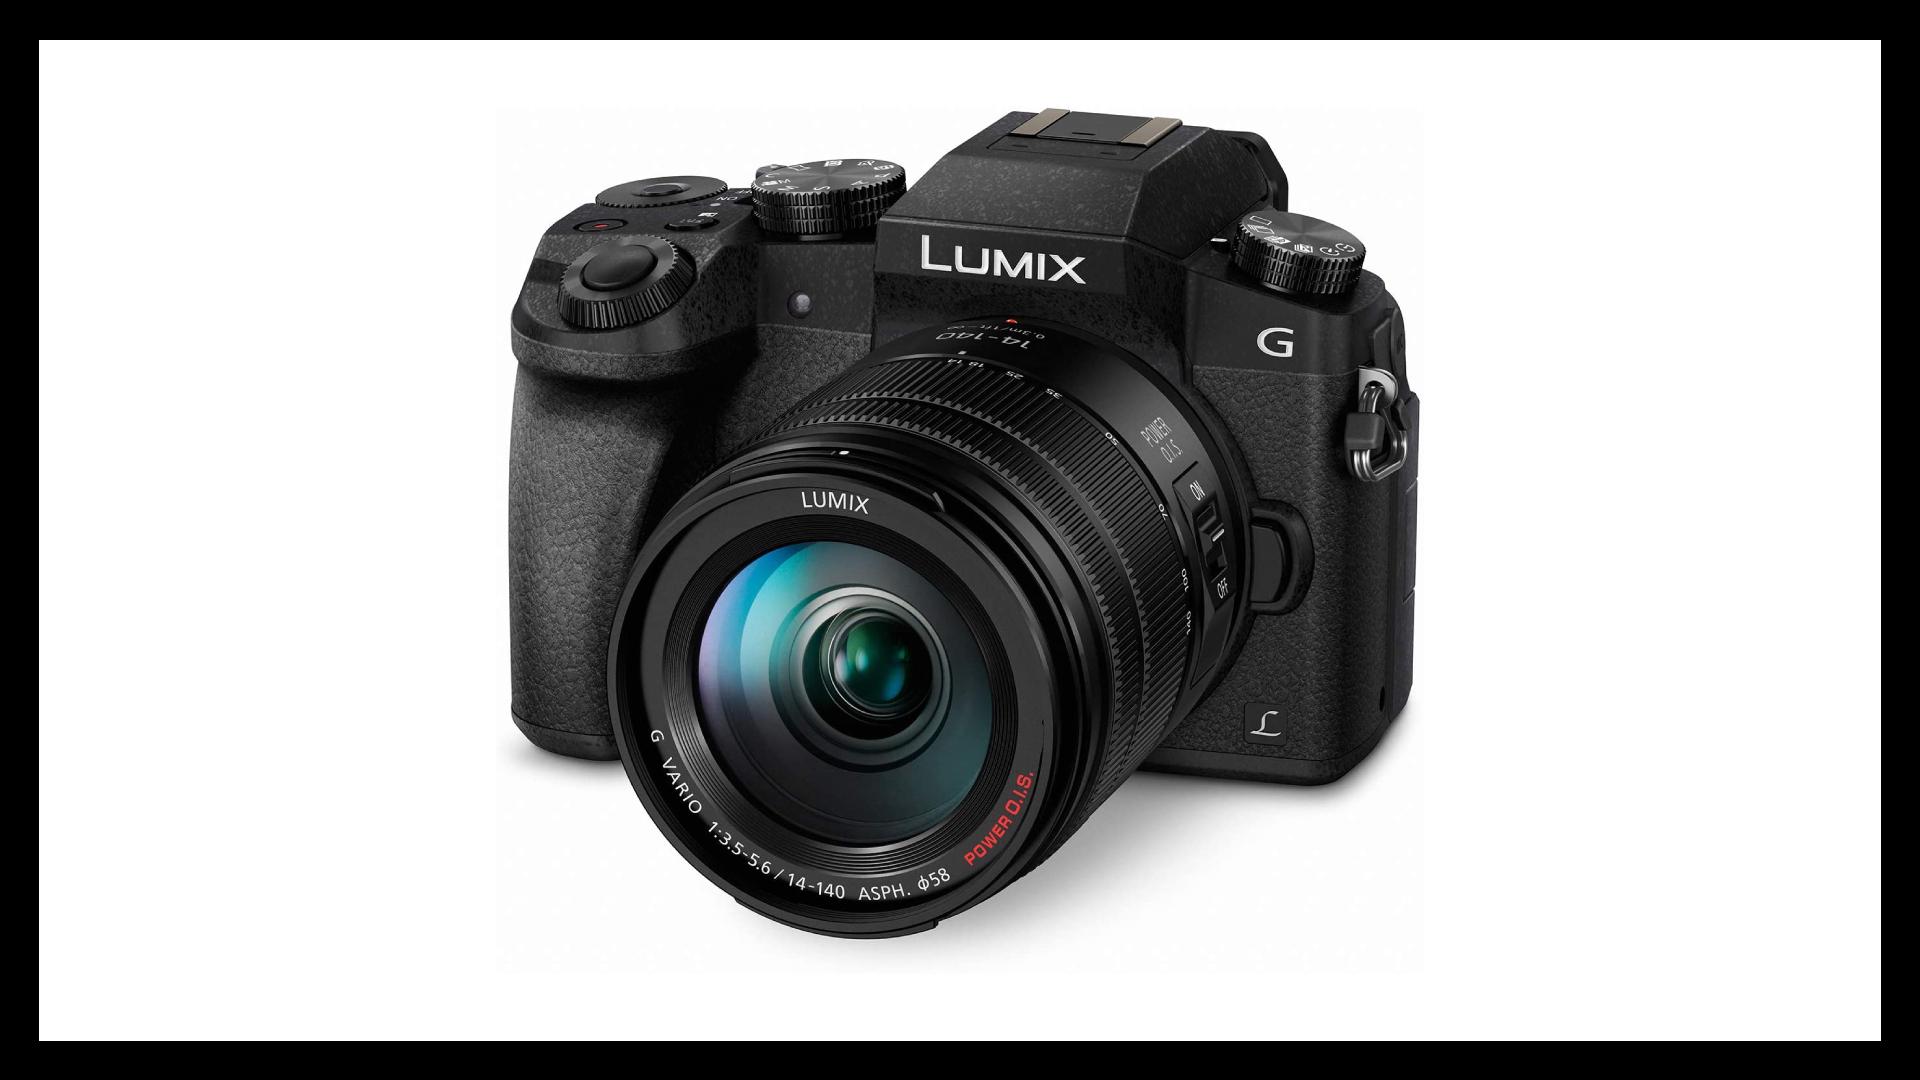 Panasonic Lumix G7 Review 2021 | Best Budget 4K Camera?